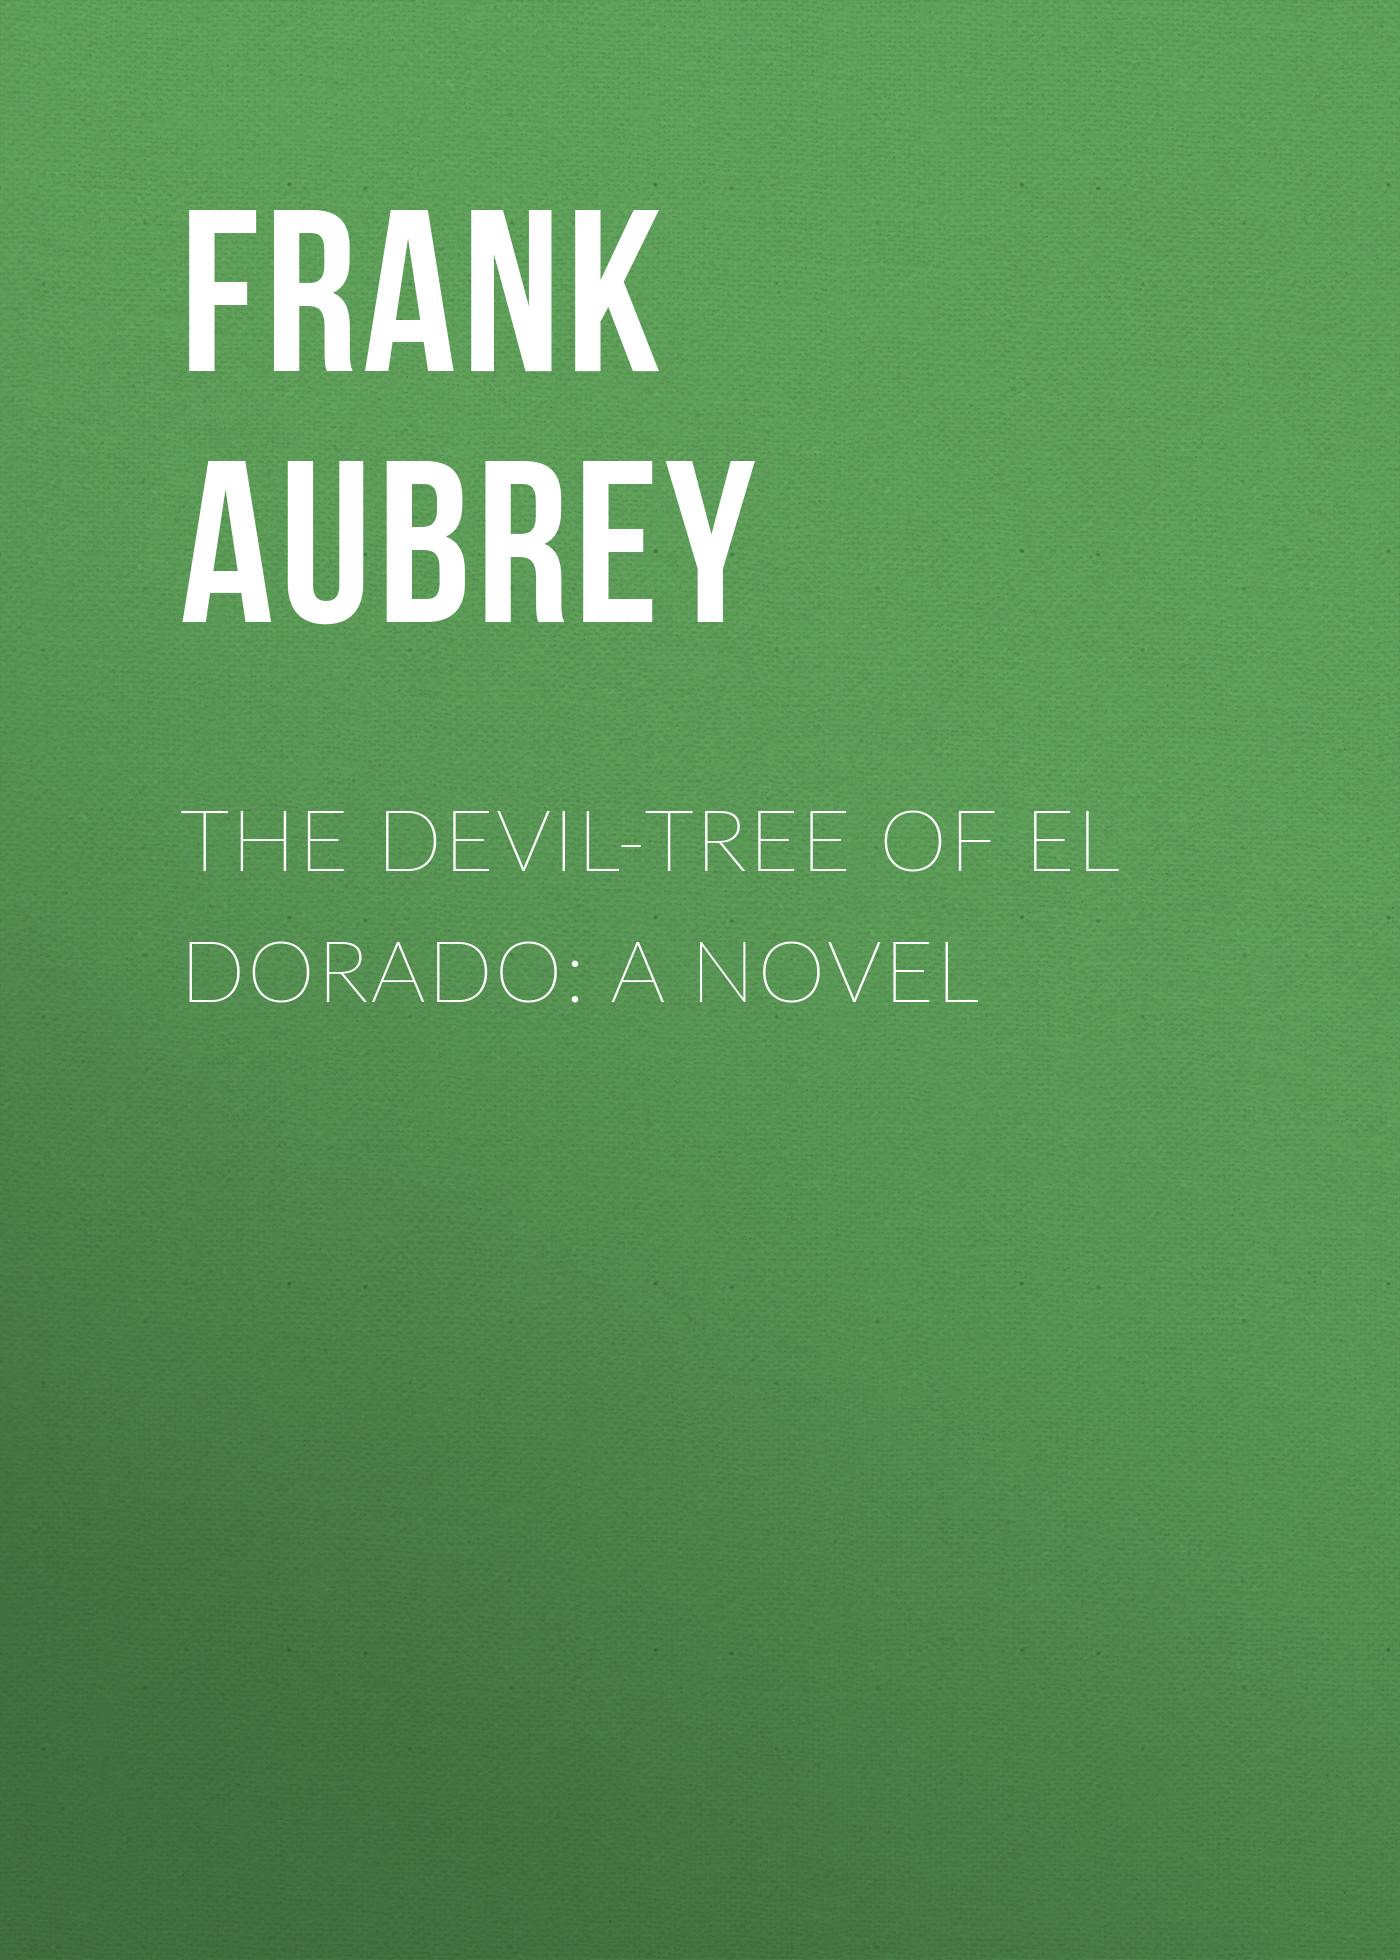 цена на Aubrey Frank The Devil-Tree of El Dorado: A Novel